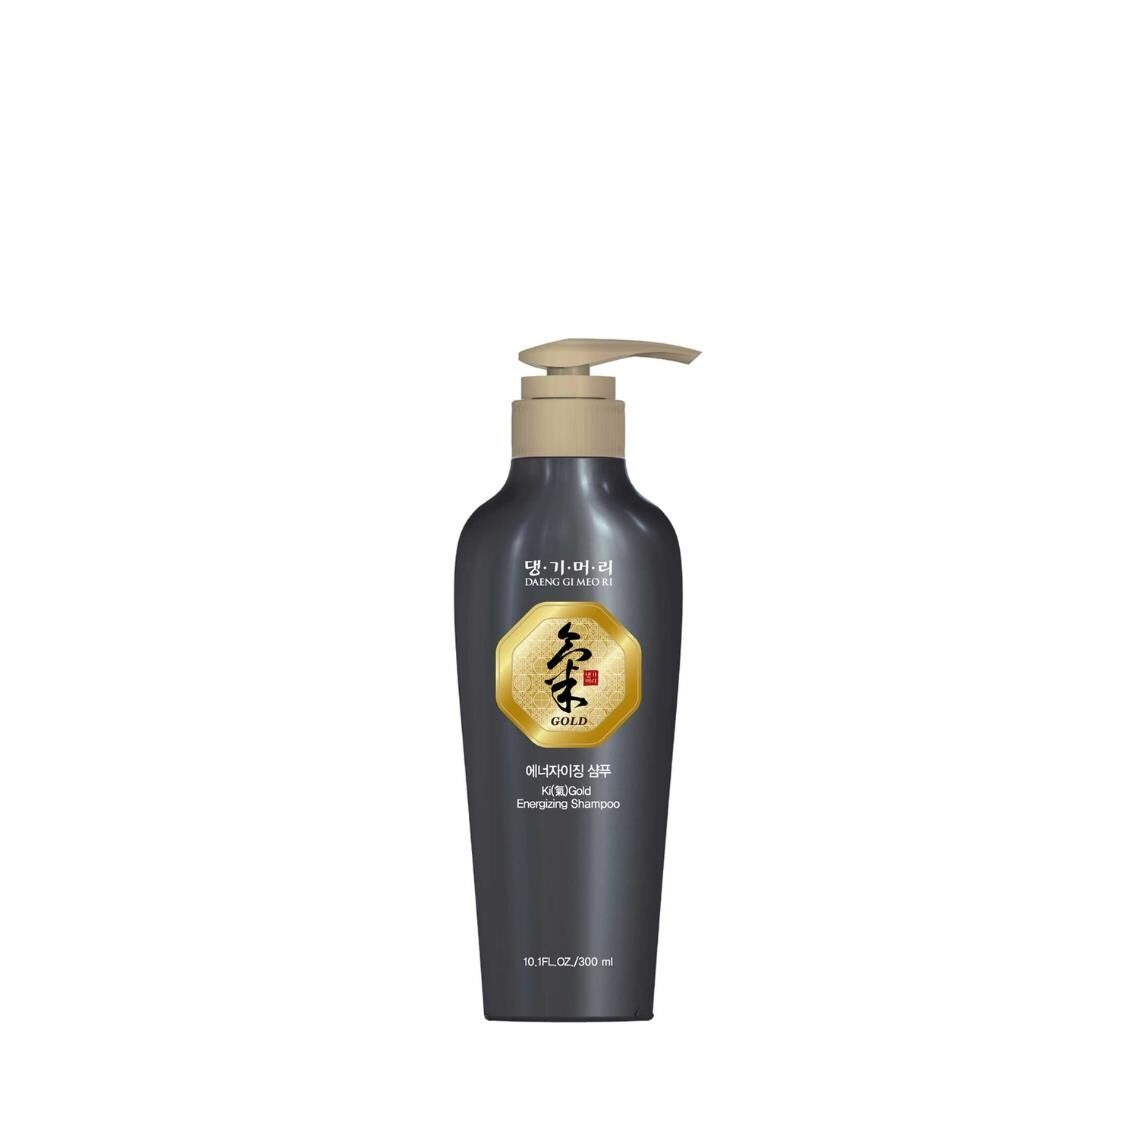 Ki Gold Energizing Shampoo 300ml